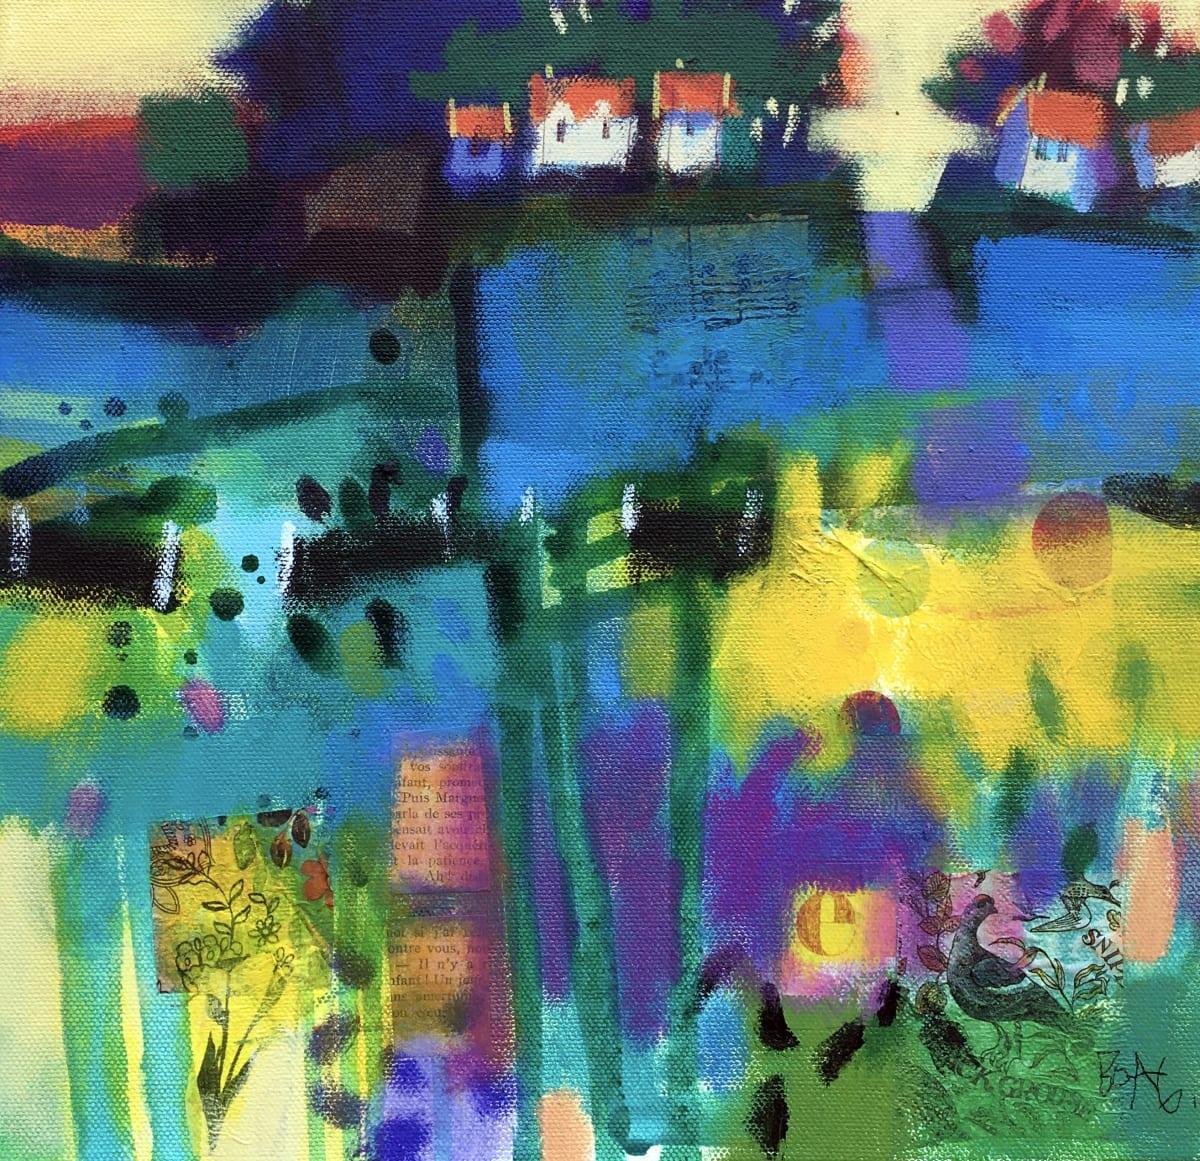 Windyedge Blues by francis boag